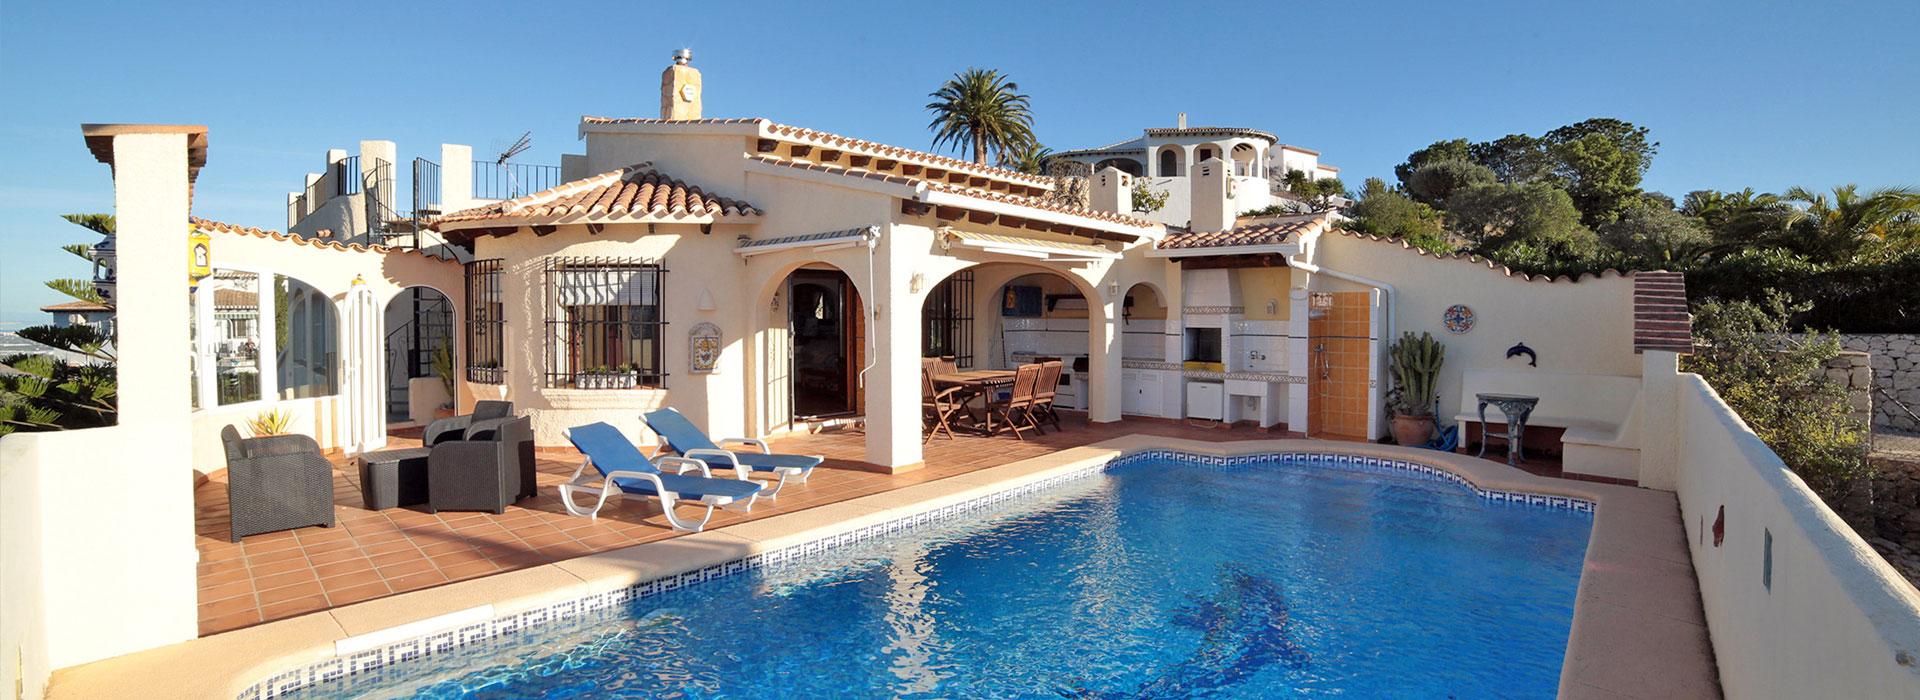 acb.immo - Grande villa ensoleillée avec piscine et vues panoramiques à Monte pego, Denia